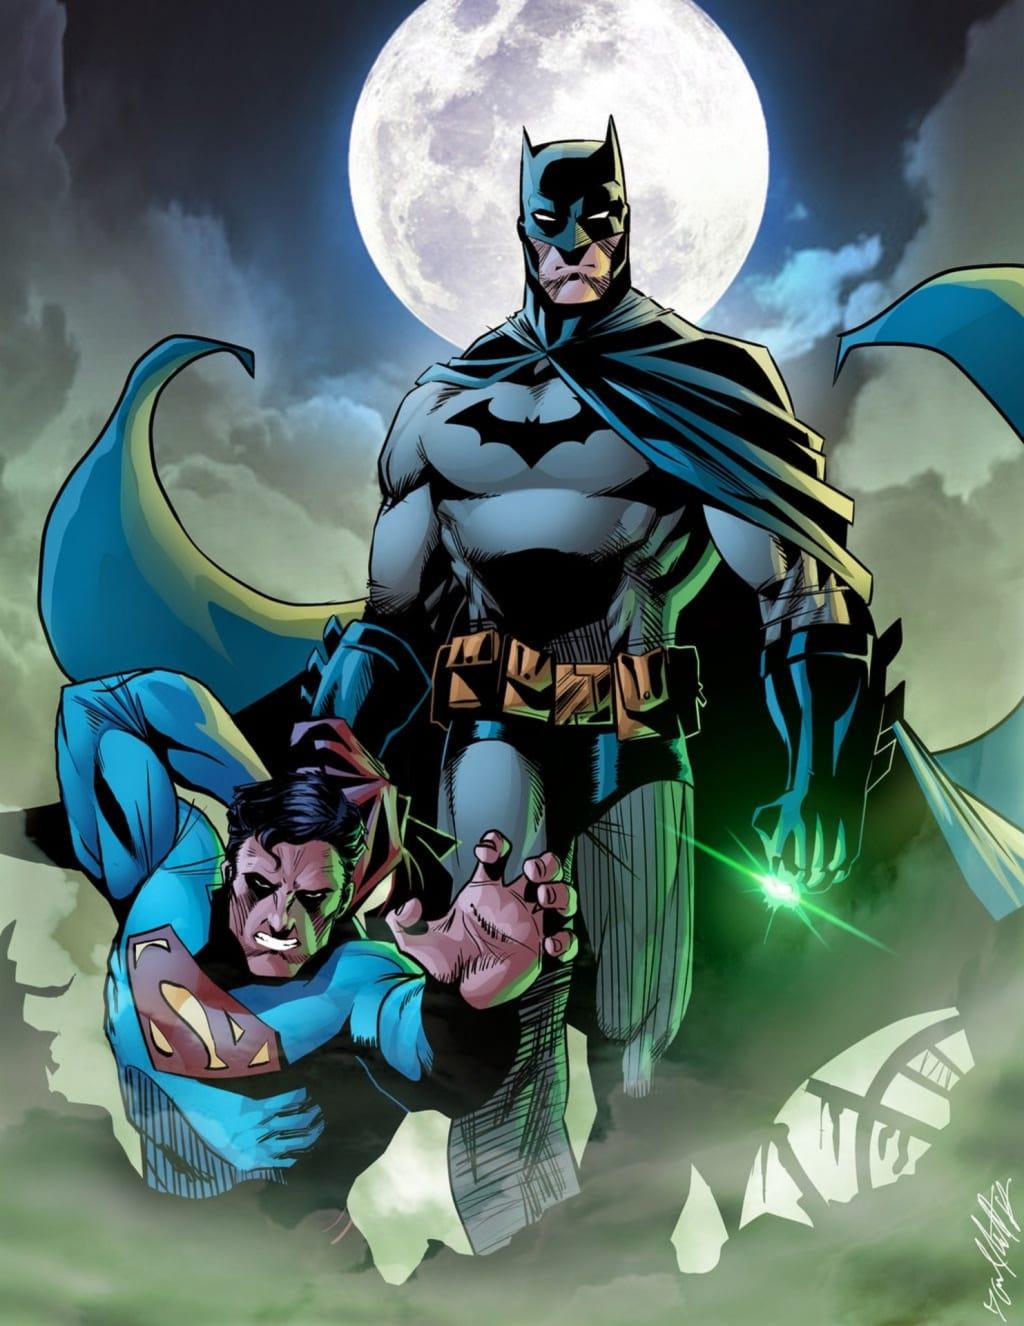 How Batman Would Defeat the Justice League